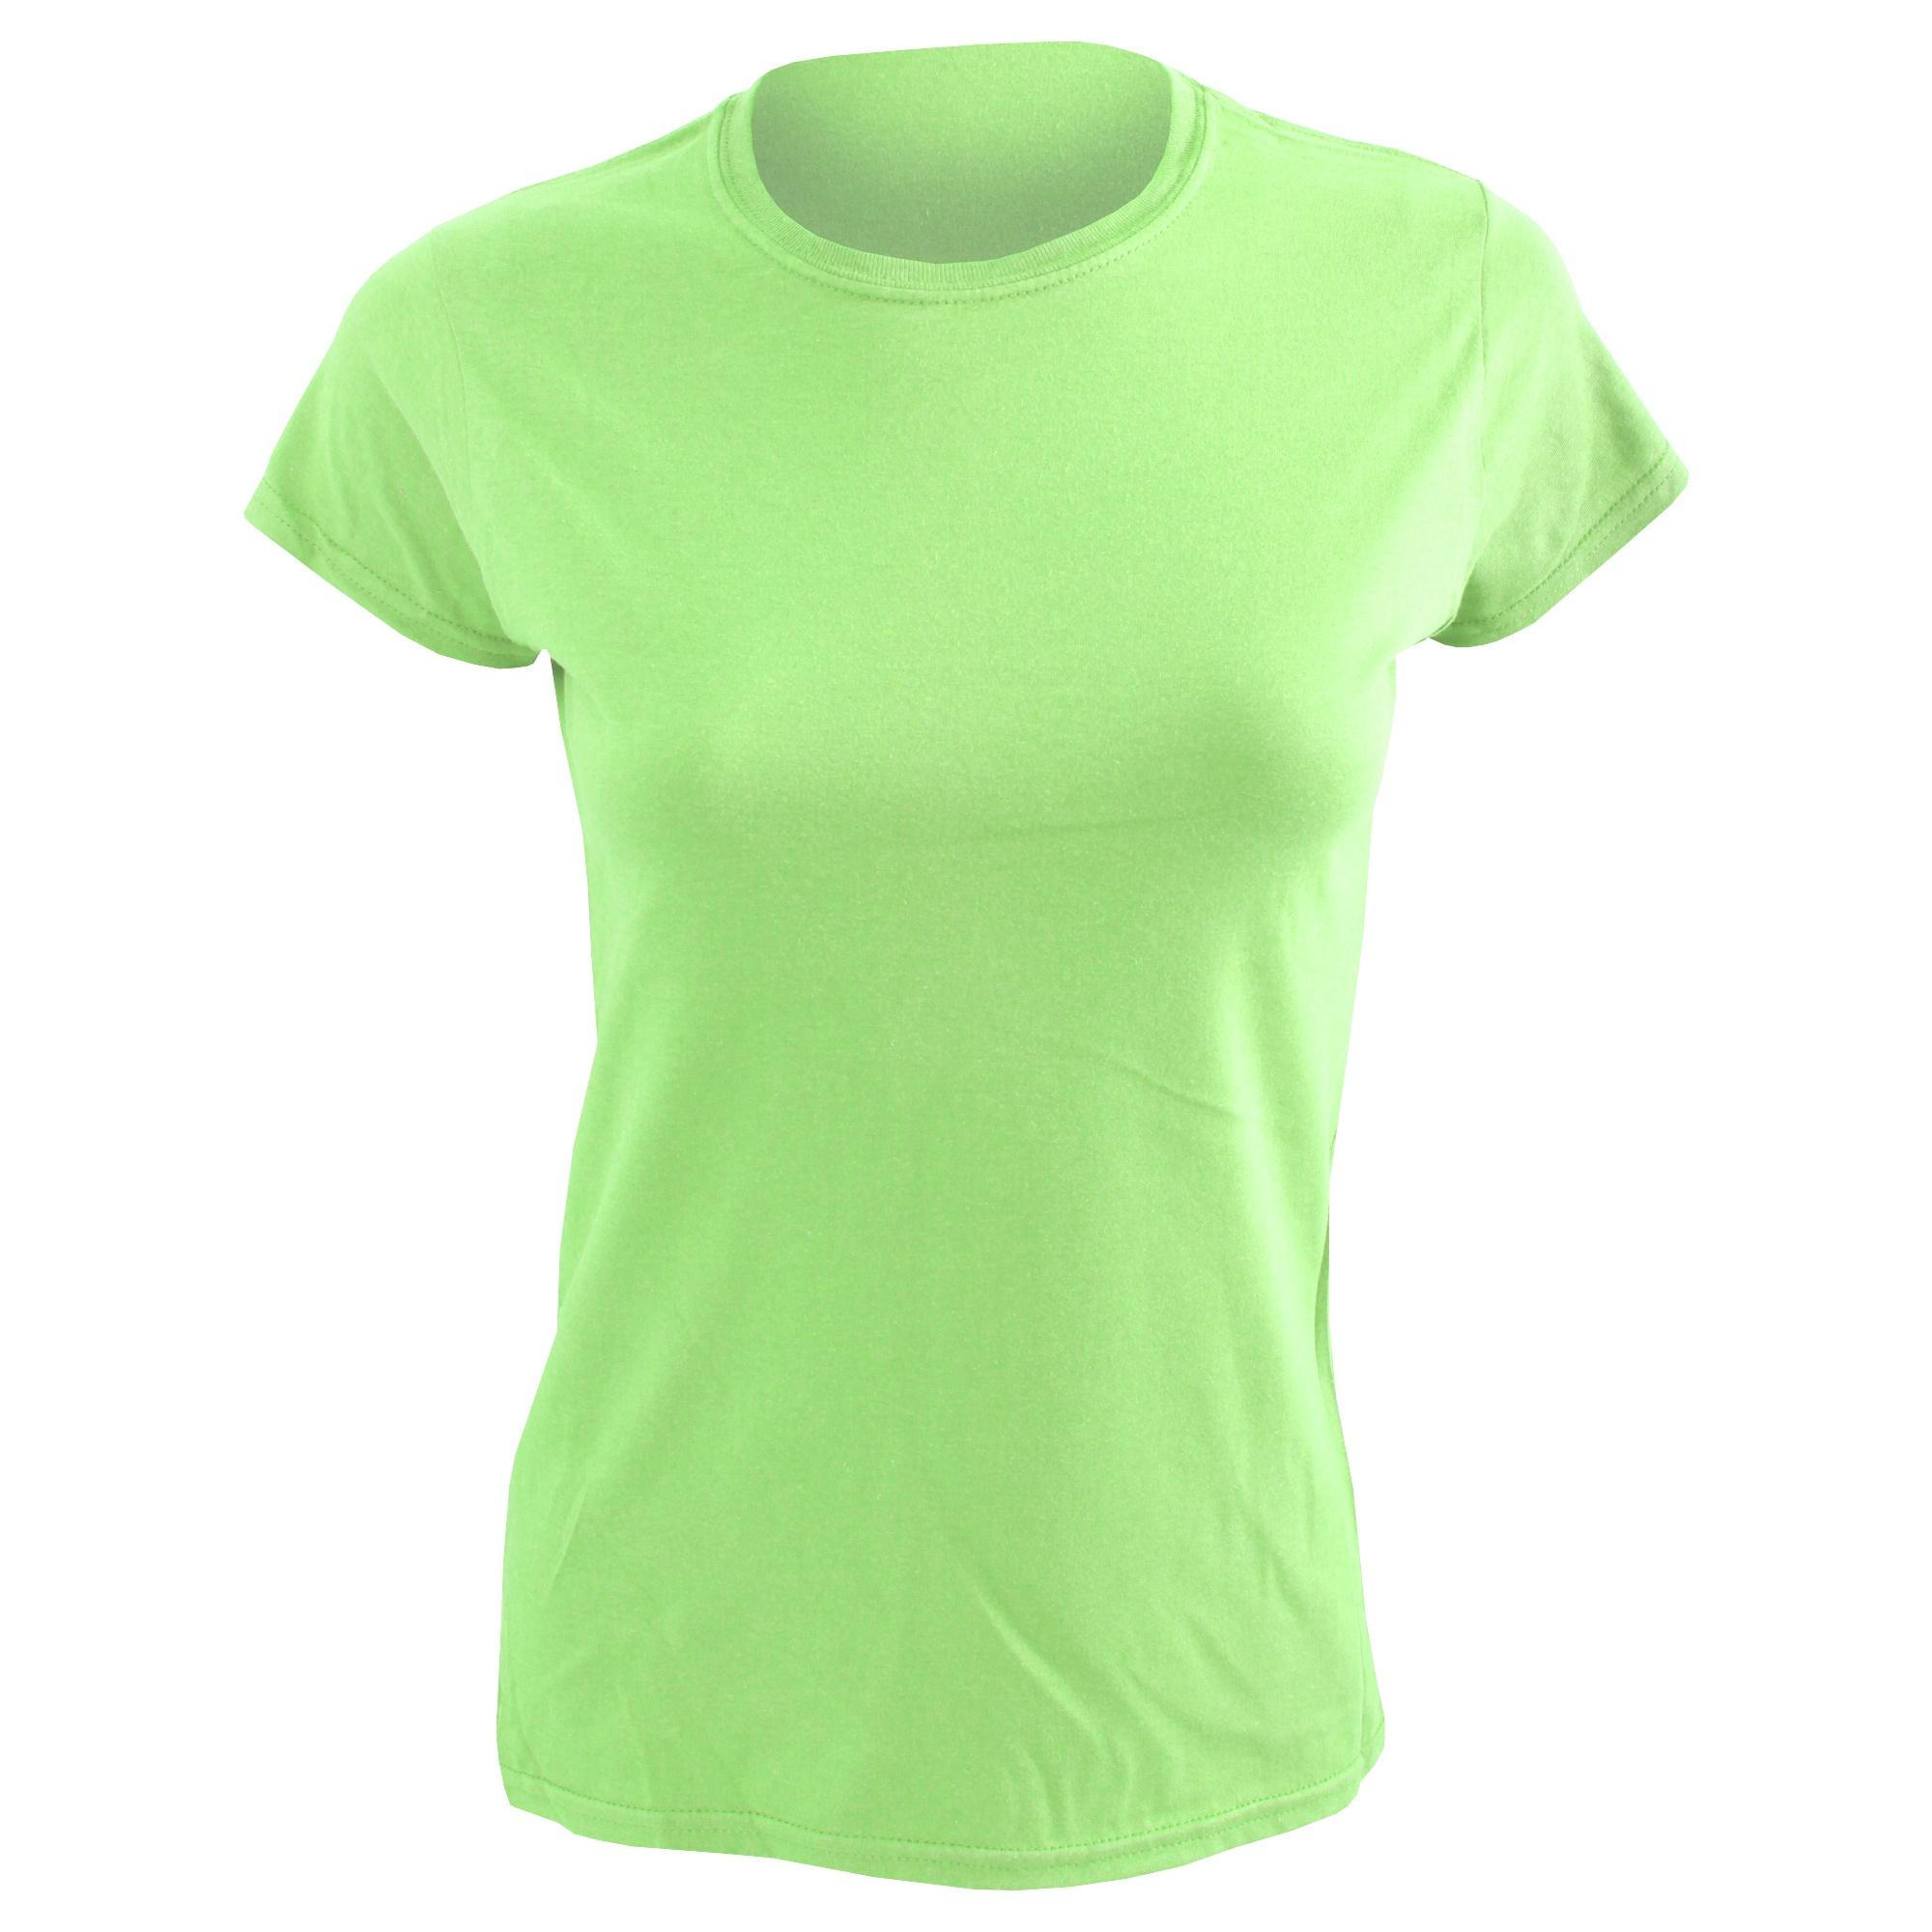 Gildan Ladies Soft Style Short Sleeve T-Shirt (XL) (Mint Green)